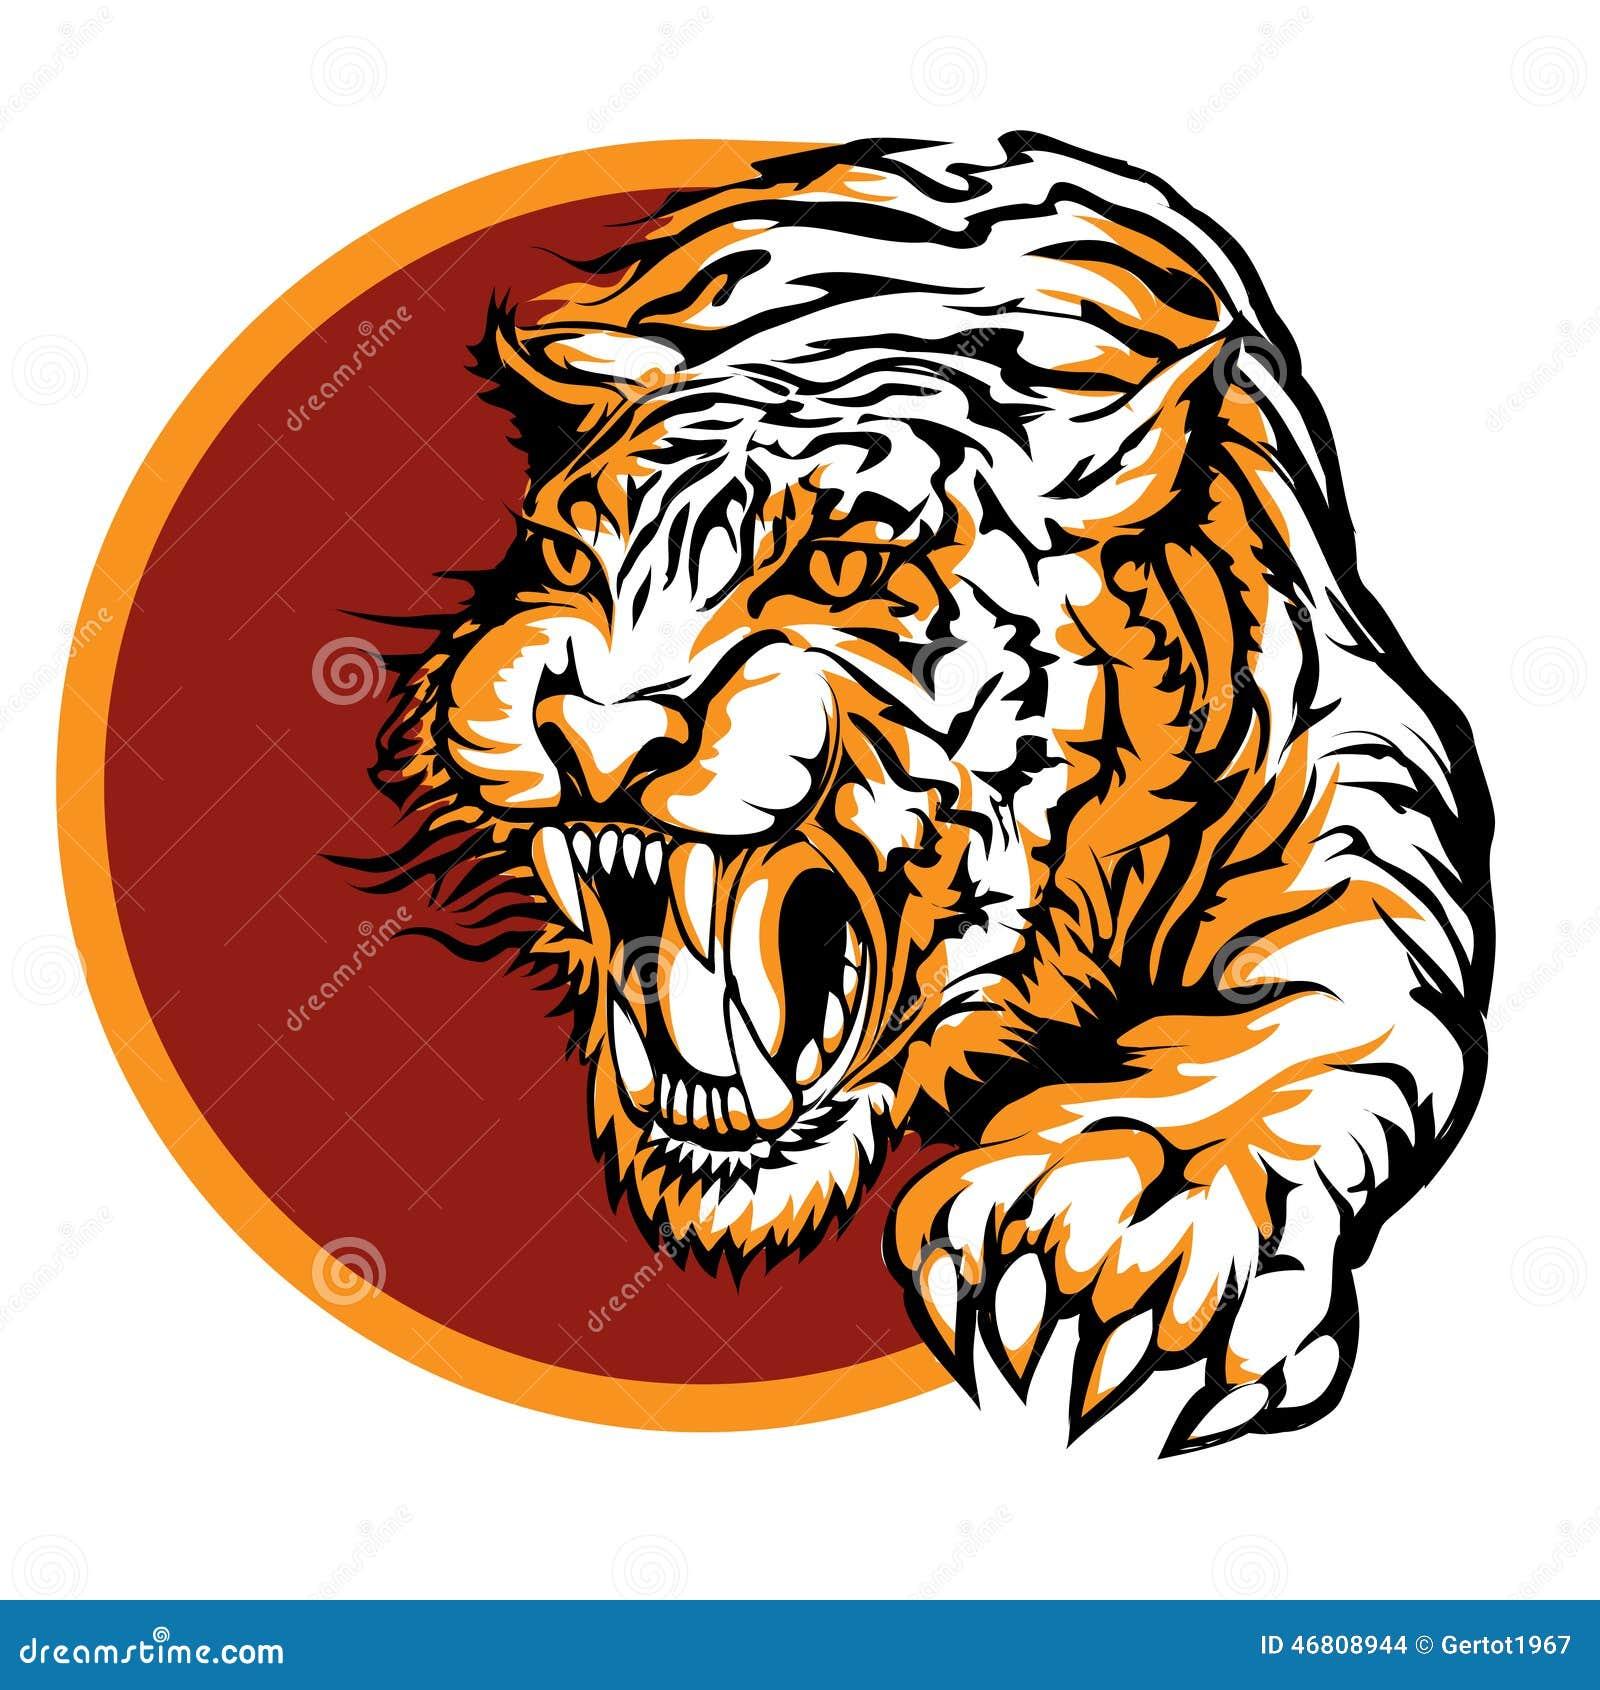 Roaring Tiger Logo Design Stock Vector - Image: 46808944